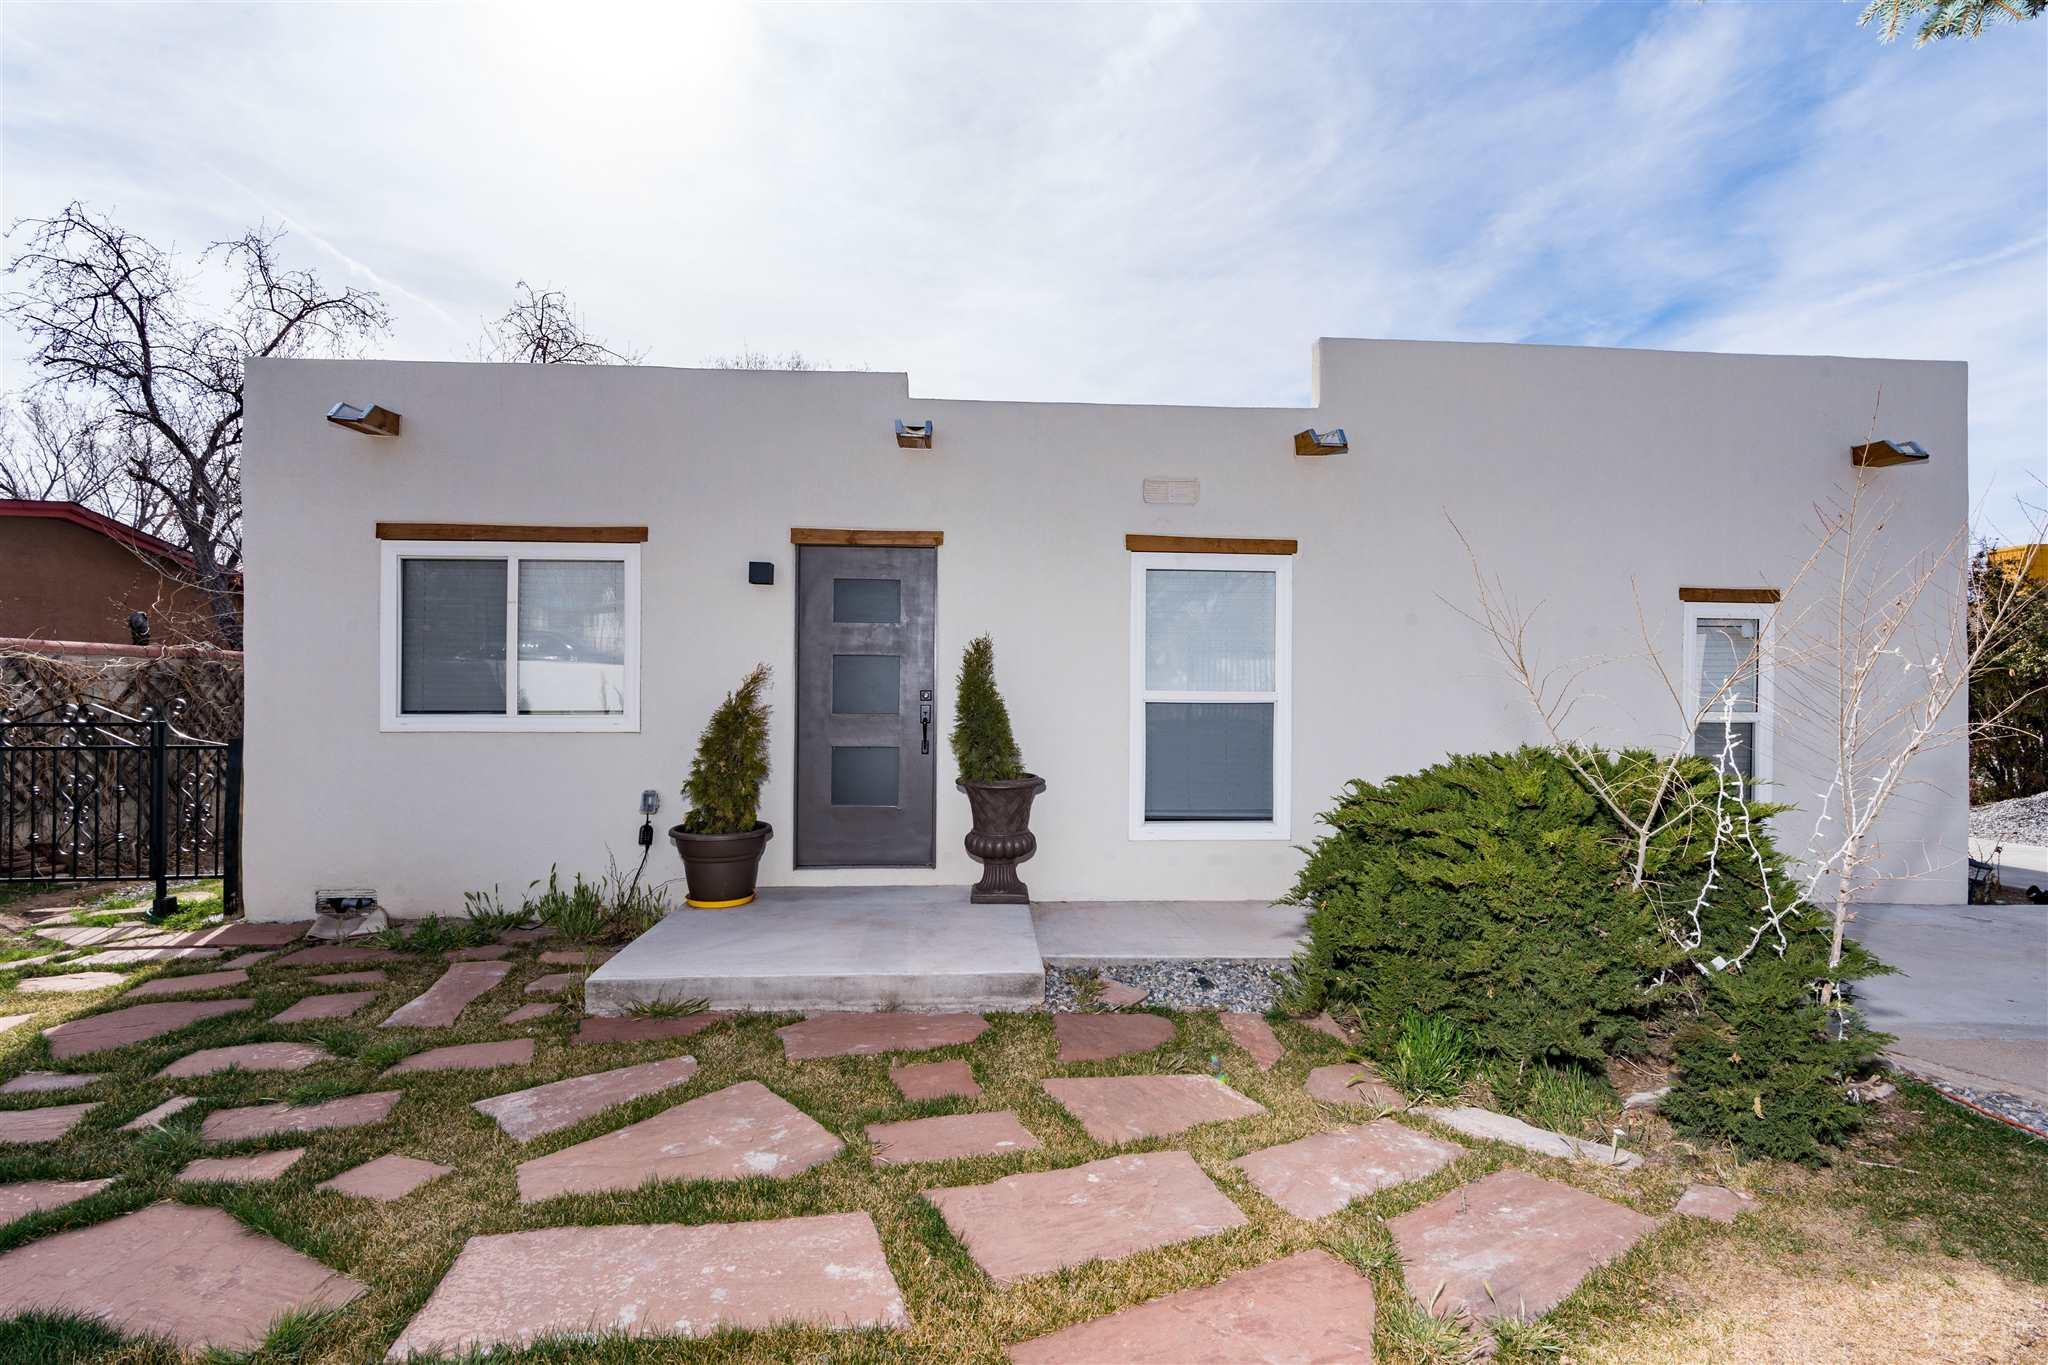 2066 Calle Lorca, Santa Fe, New Mexico 87505, 3 Bedrooms Bedrooms, ,2 BathroomsBathrooms,Single Family,For Sale,2066 Calle Lorca,202004869